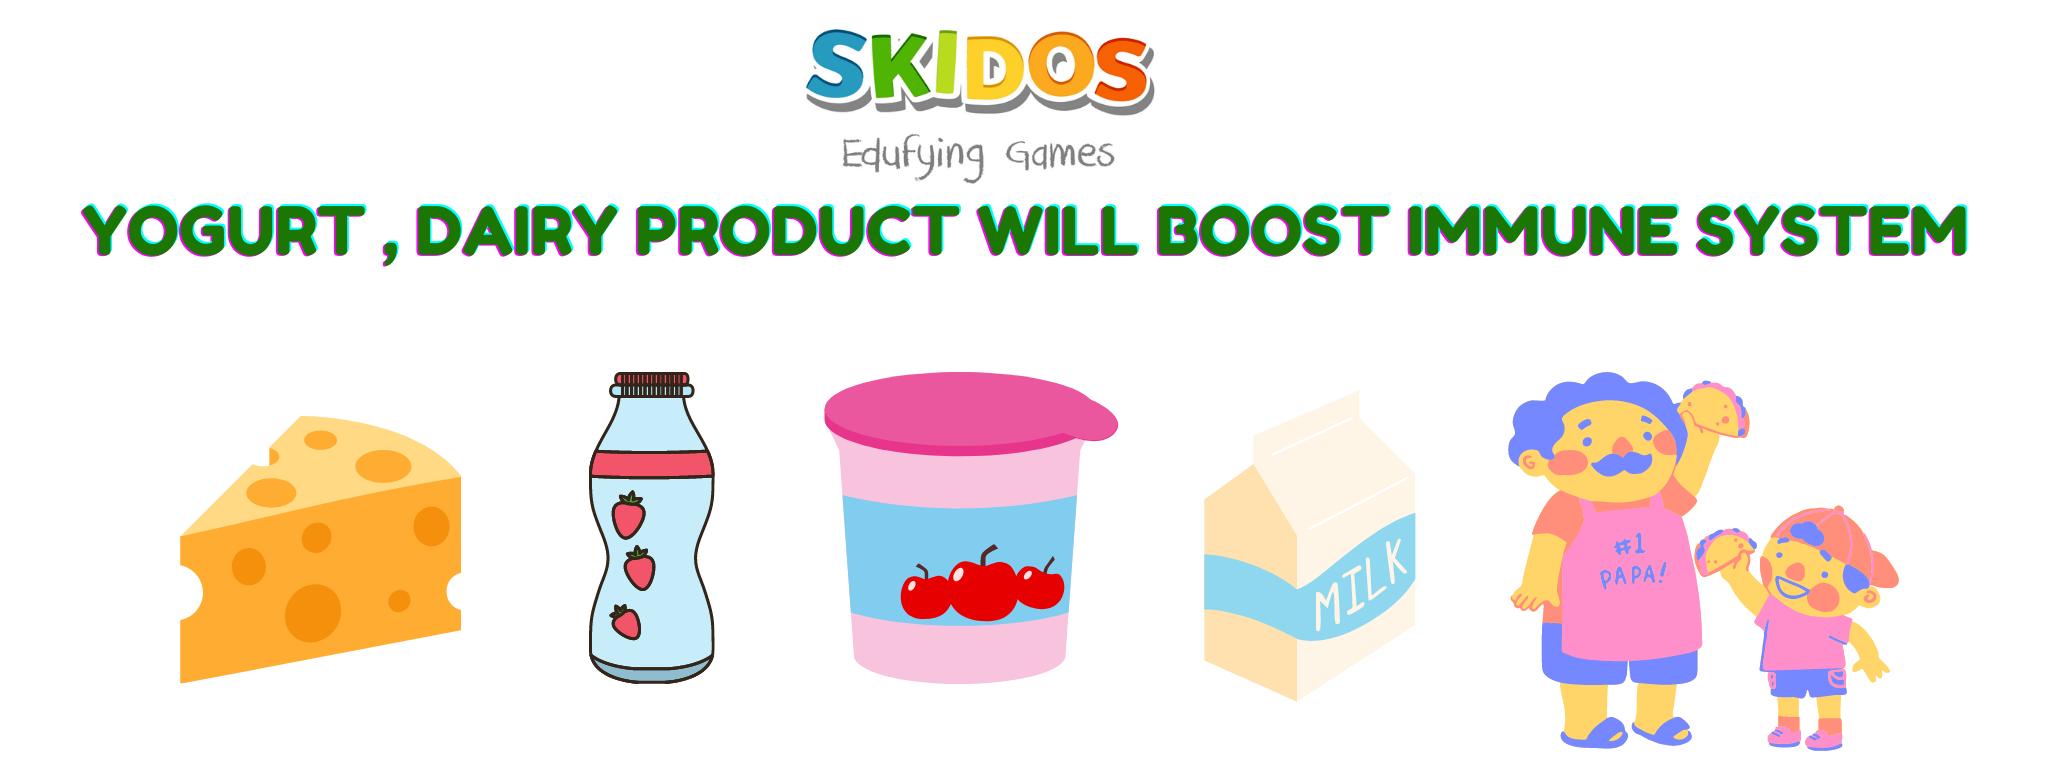 Yogurt - Immune System Boosting Foods For Kids